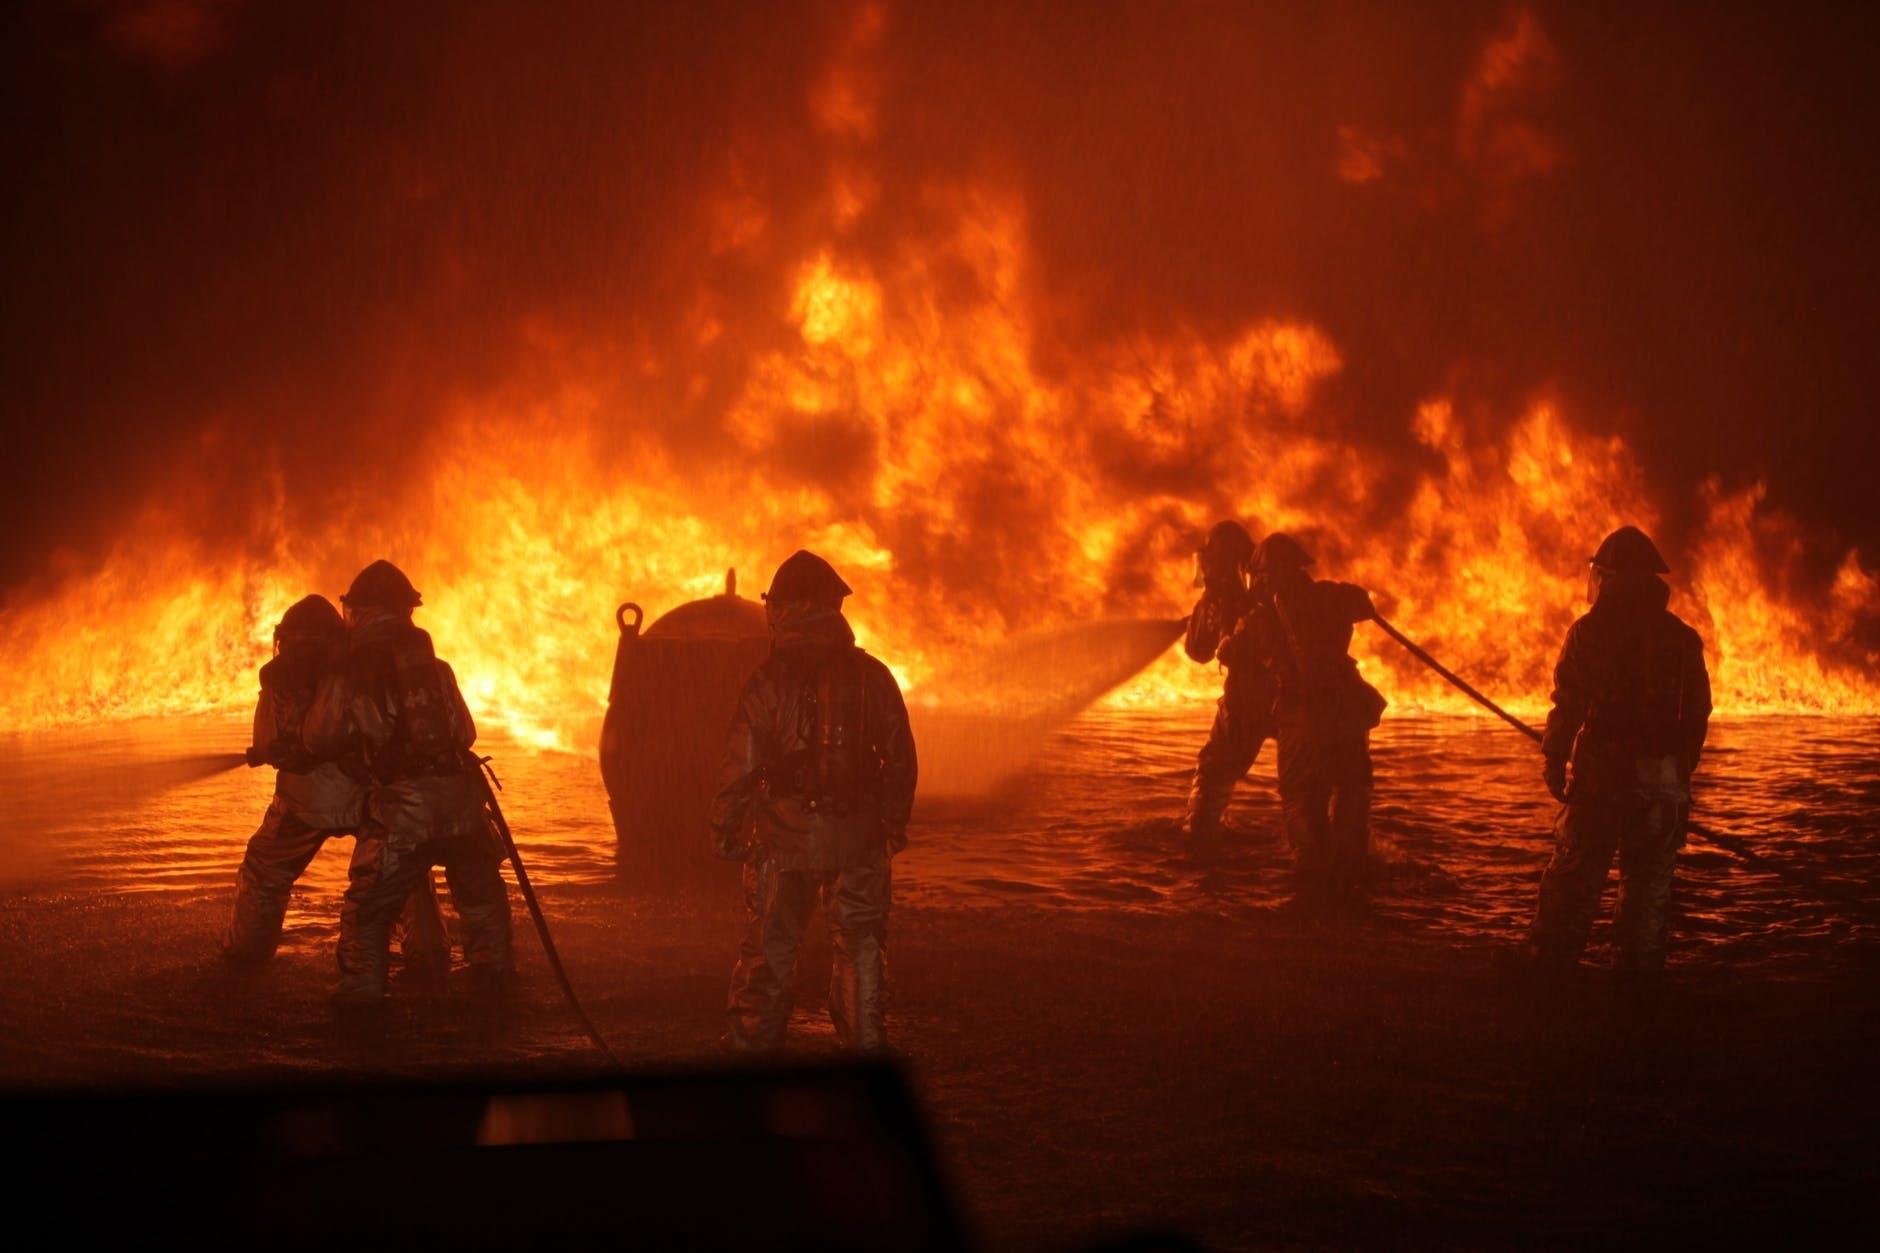 Wildfires Rage Across the Western U.S.